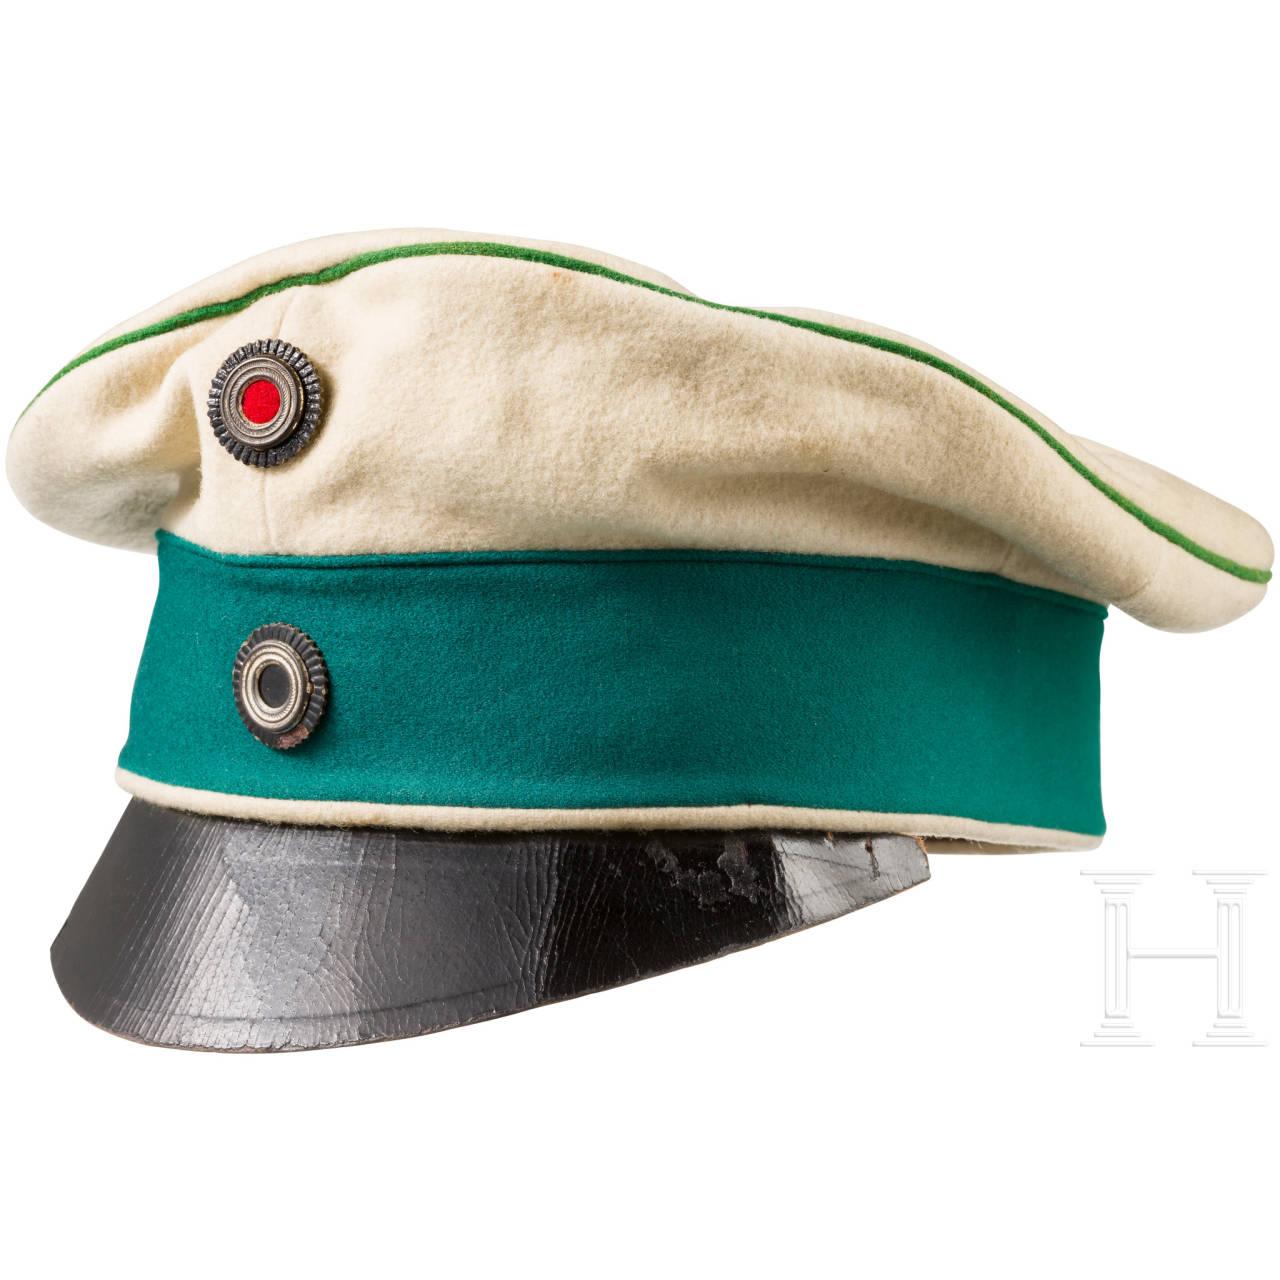 "Soft visor cap (""crusher"") for officers in the Cuirassier Regiment  ""Graf Gessler"" (Rhenish) No. 8"